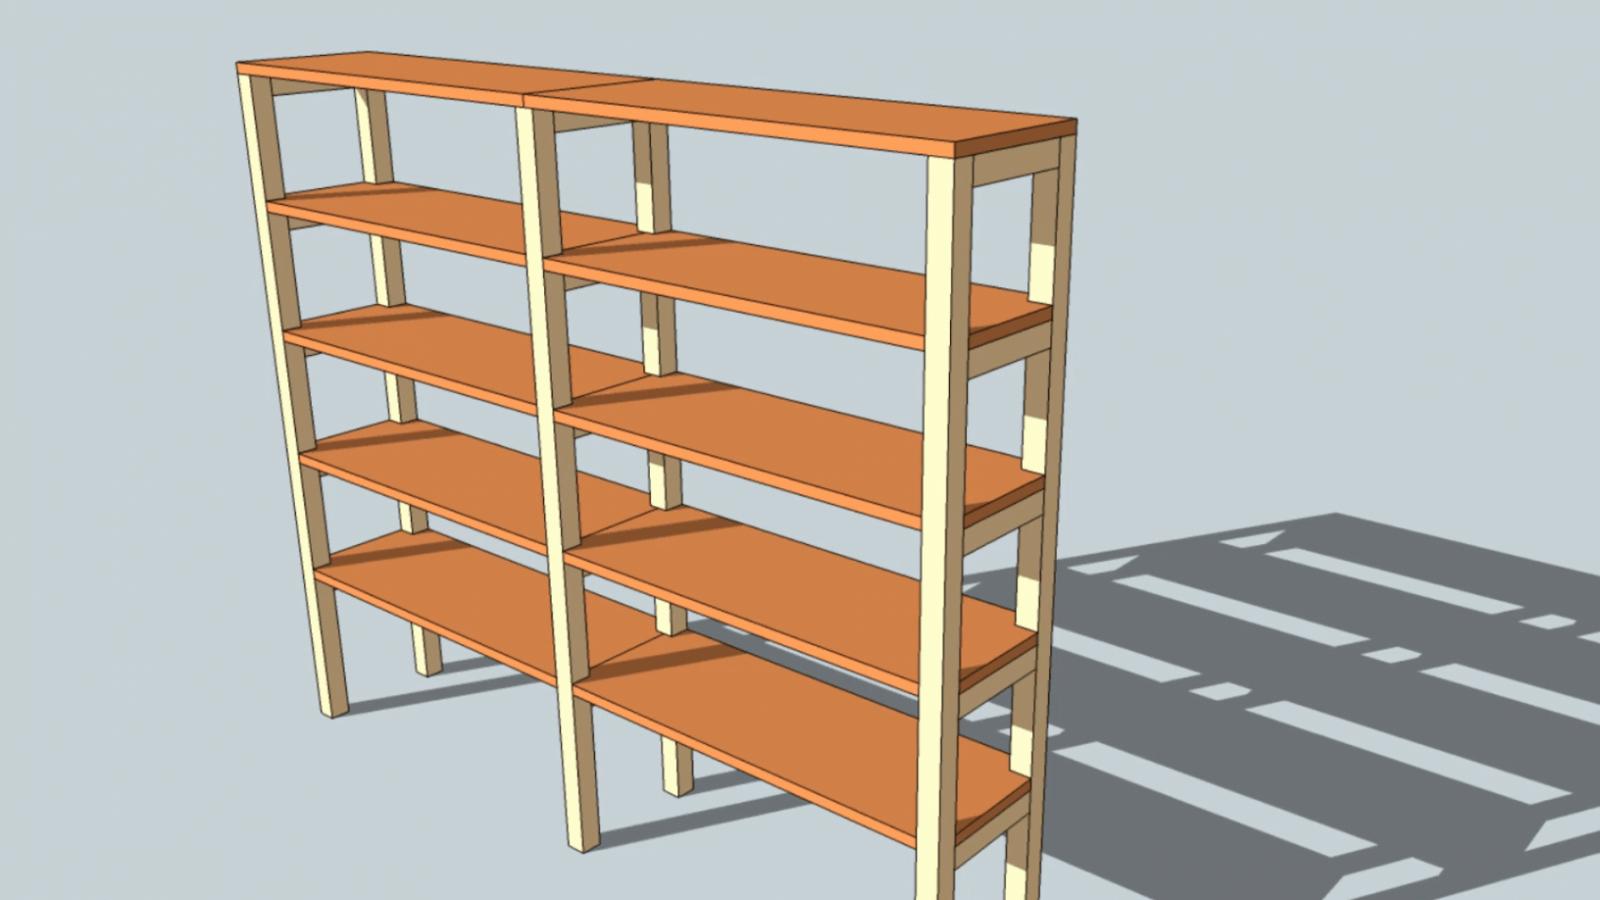 Regal Treppe Selber Bauen Elegant Luxuriös Einfaches Regal Selber